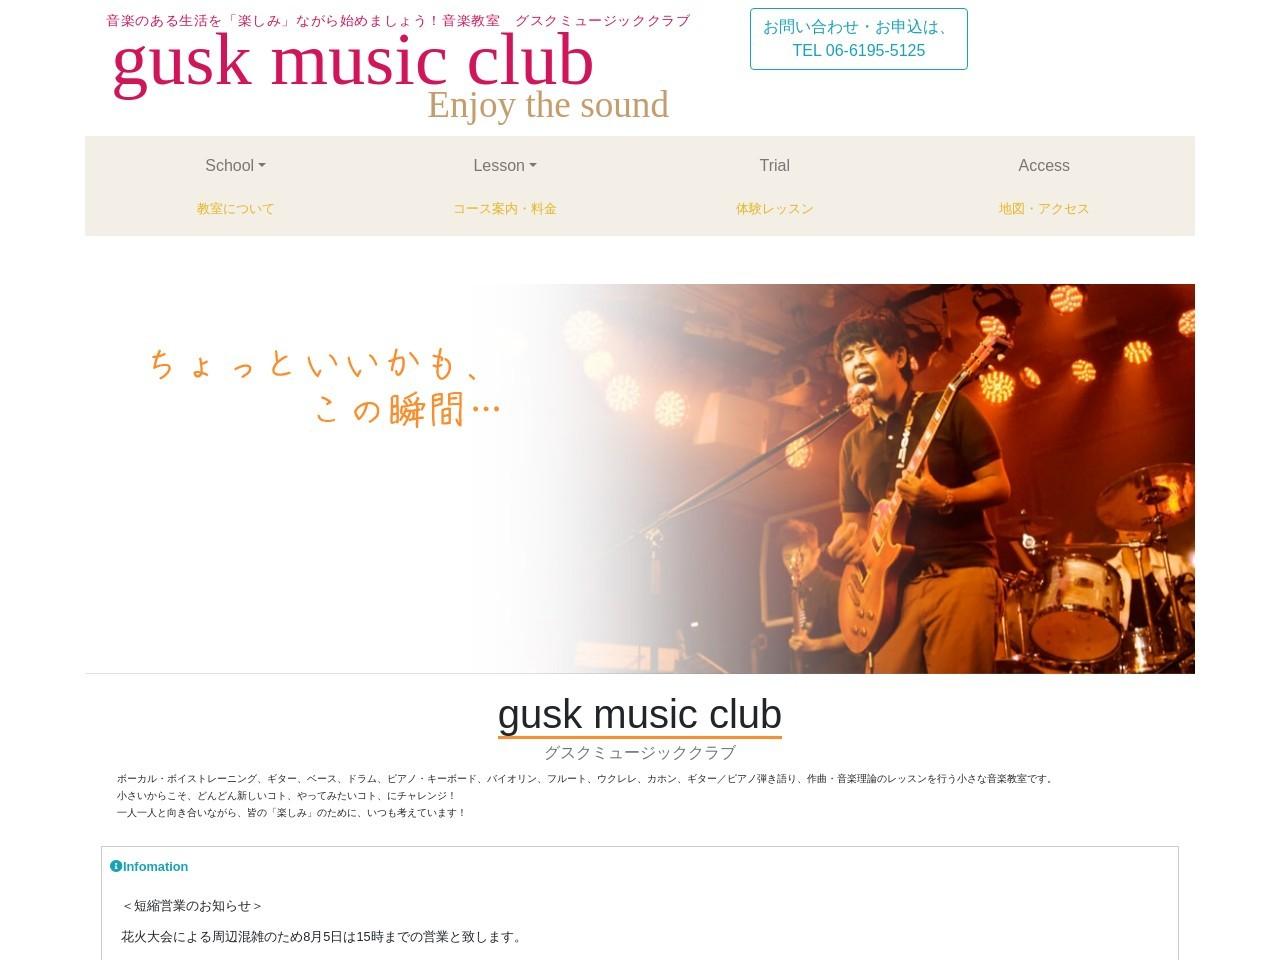 gusk music clubのサムネイル